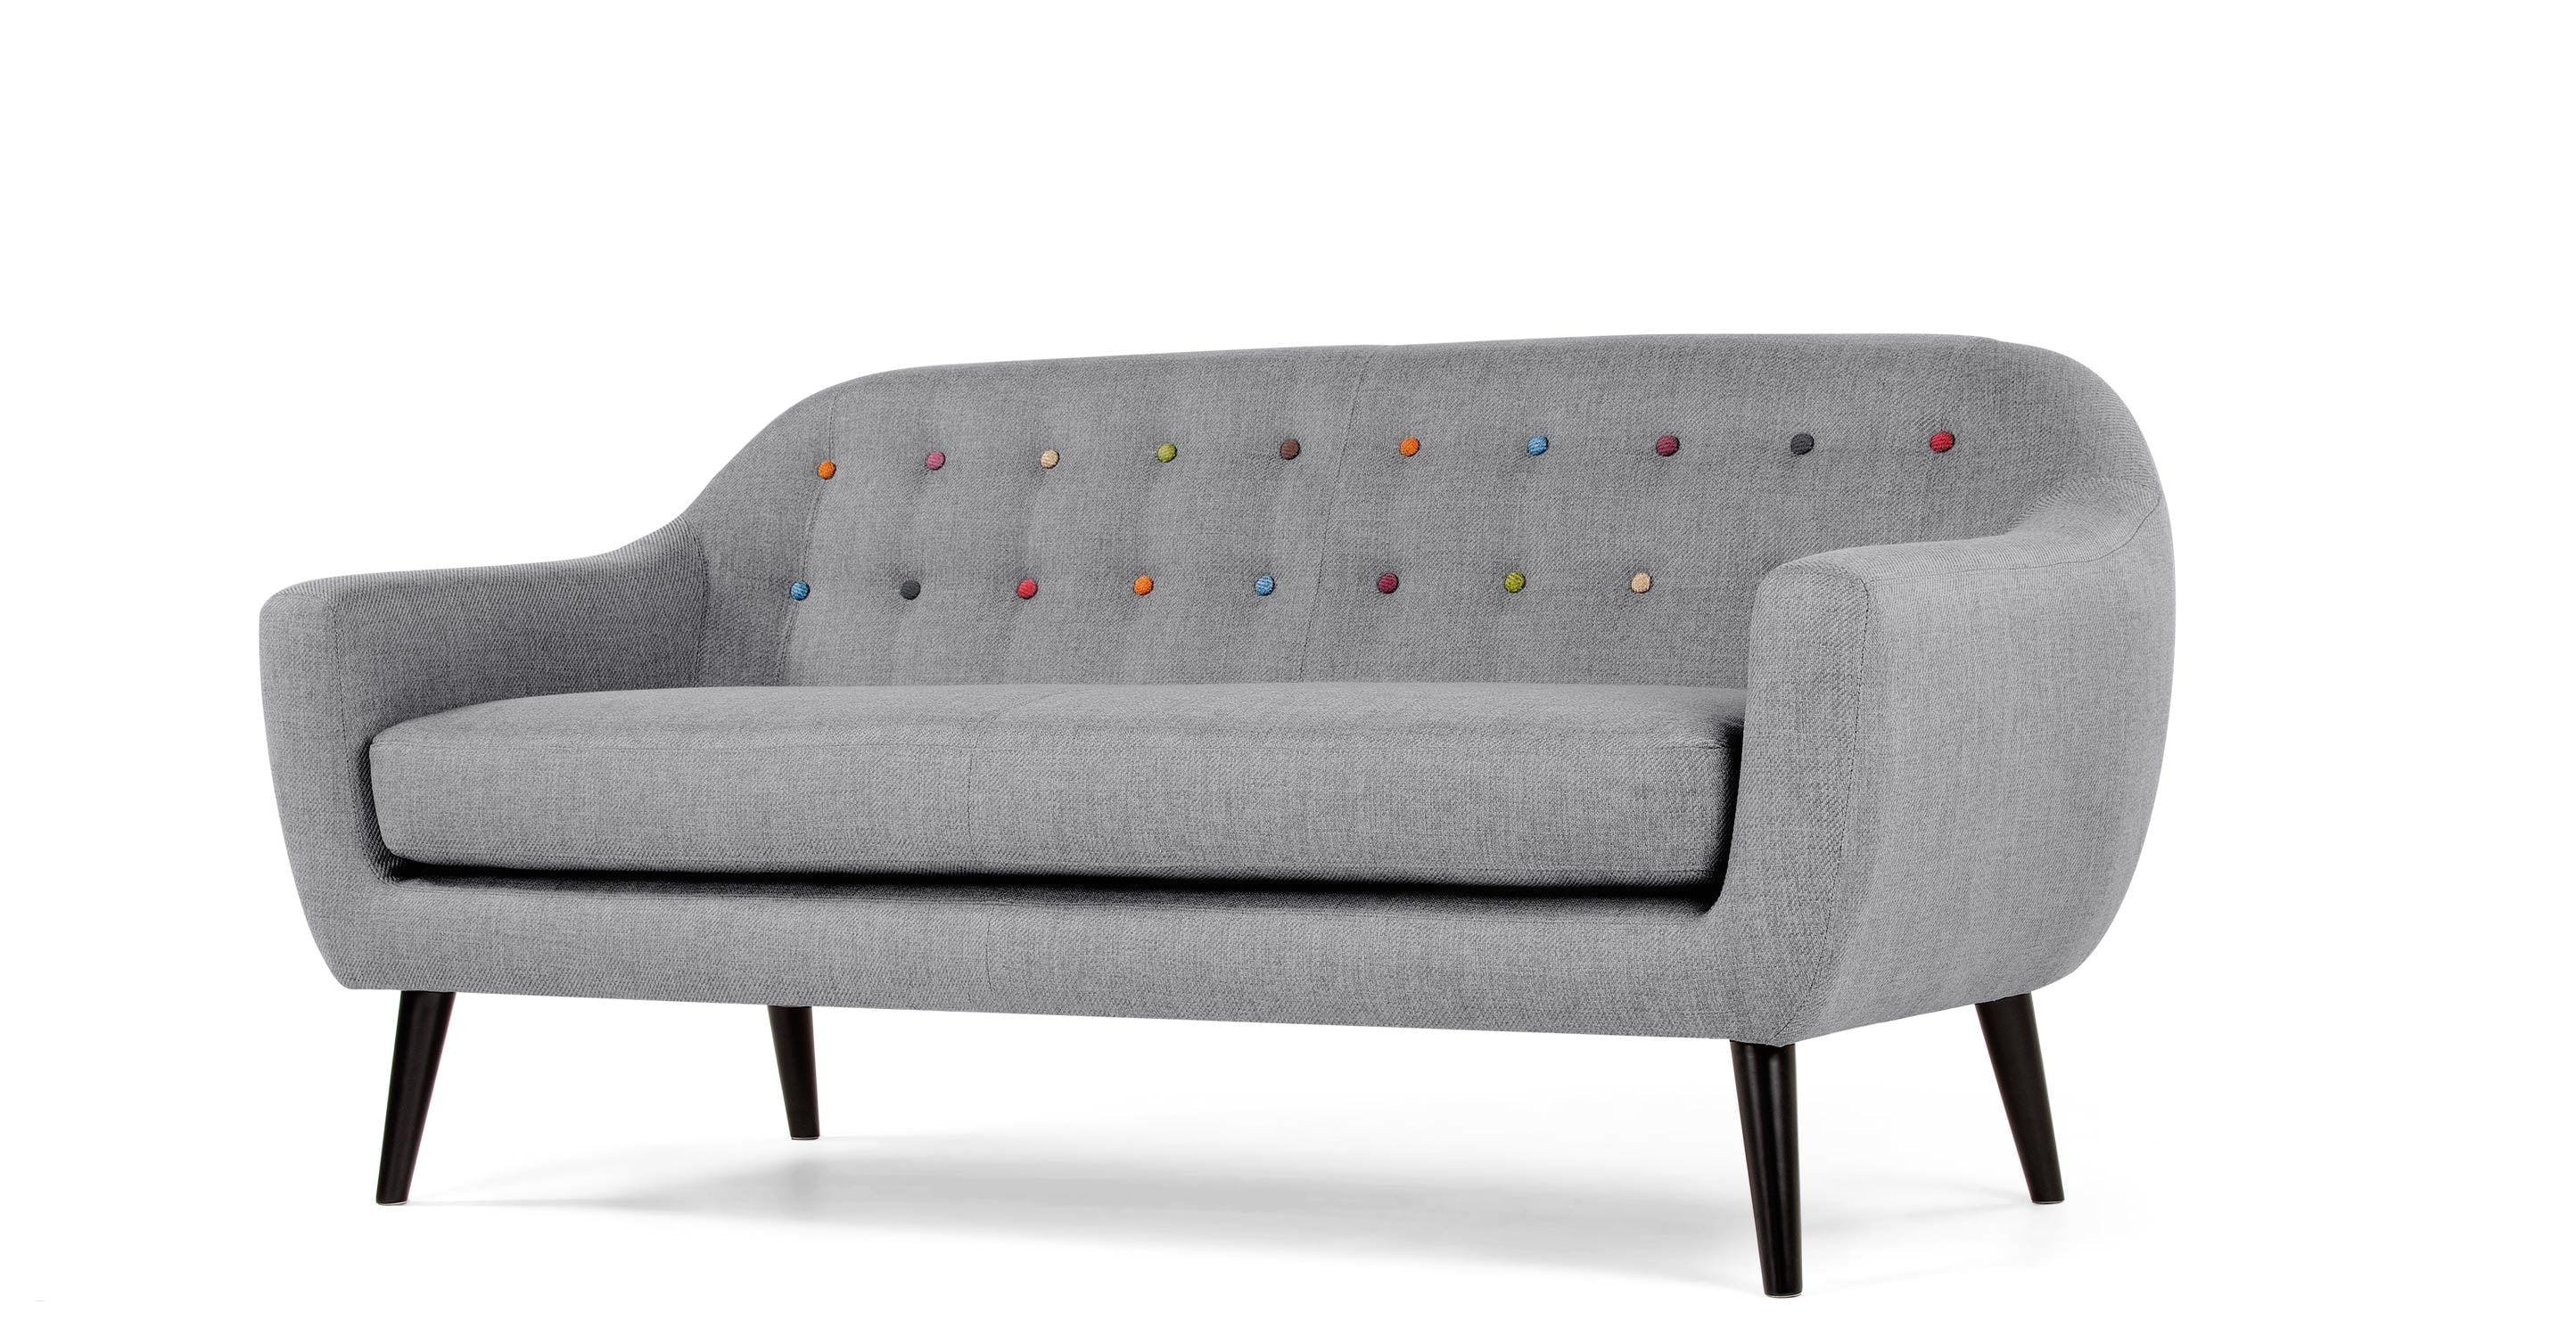 macys outdoor furniture elegant sofa big gunstige sofa macys furniture 0d archives modern house